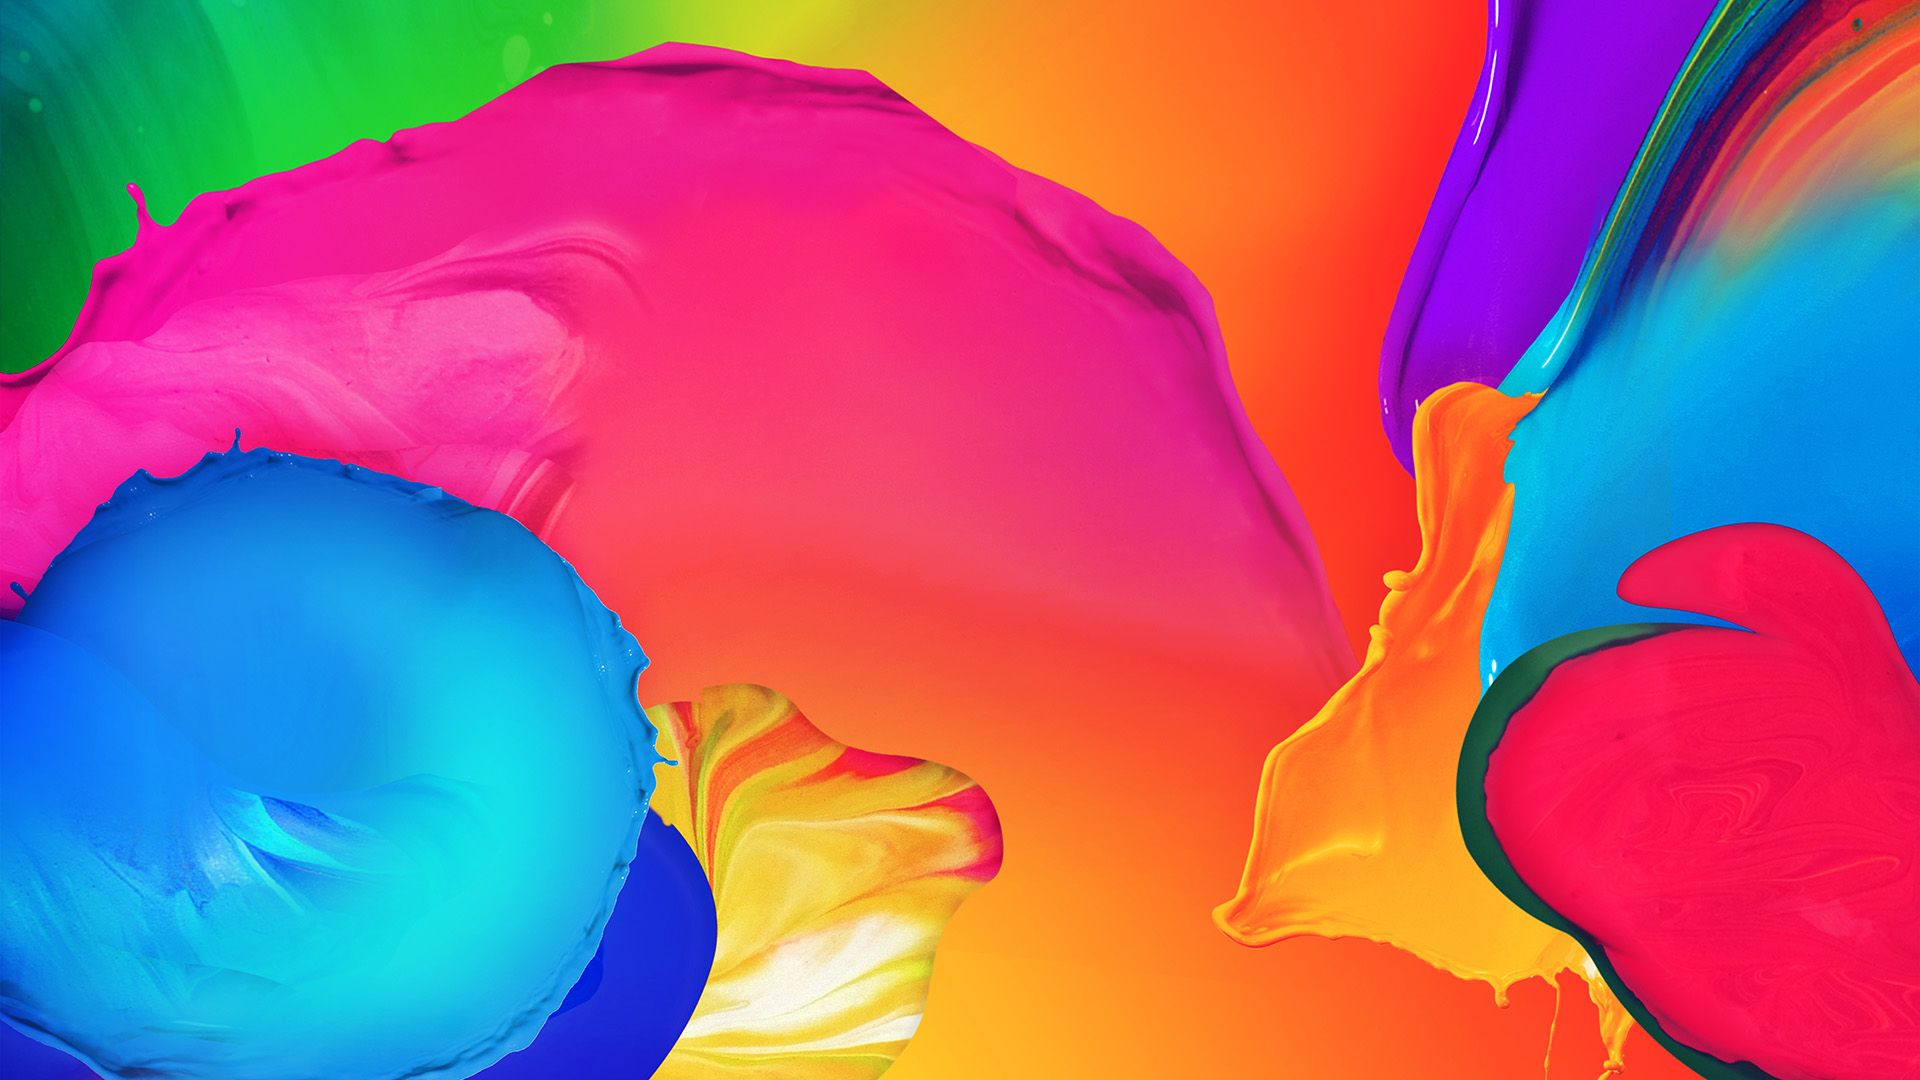 Rainbow full hd 1080p wallpaper